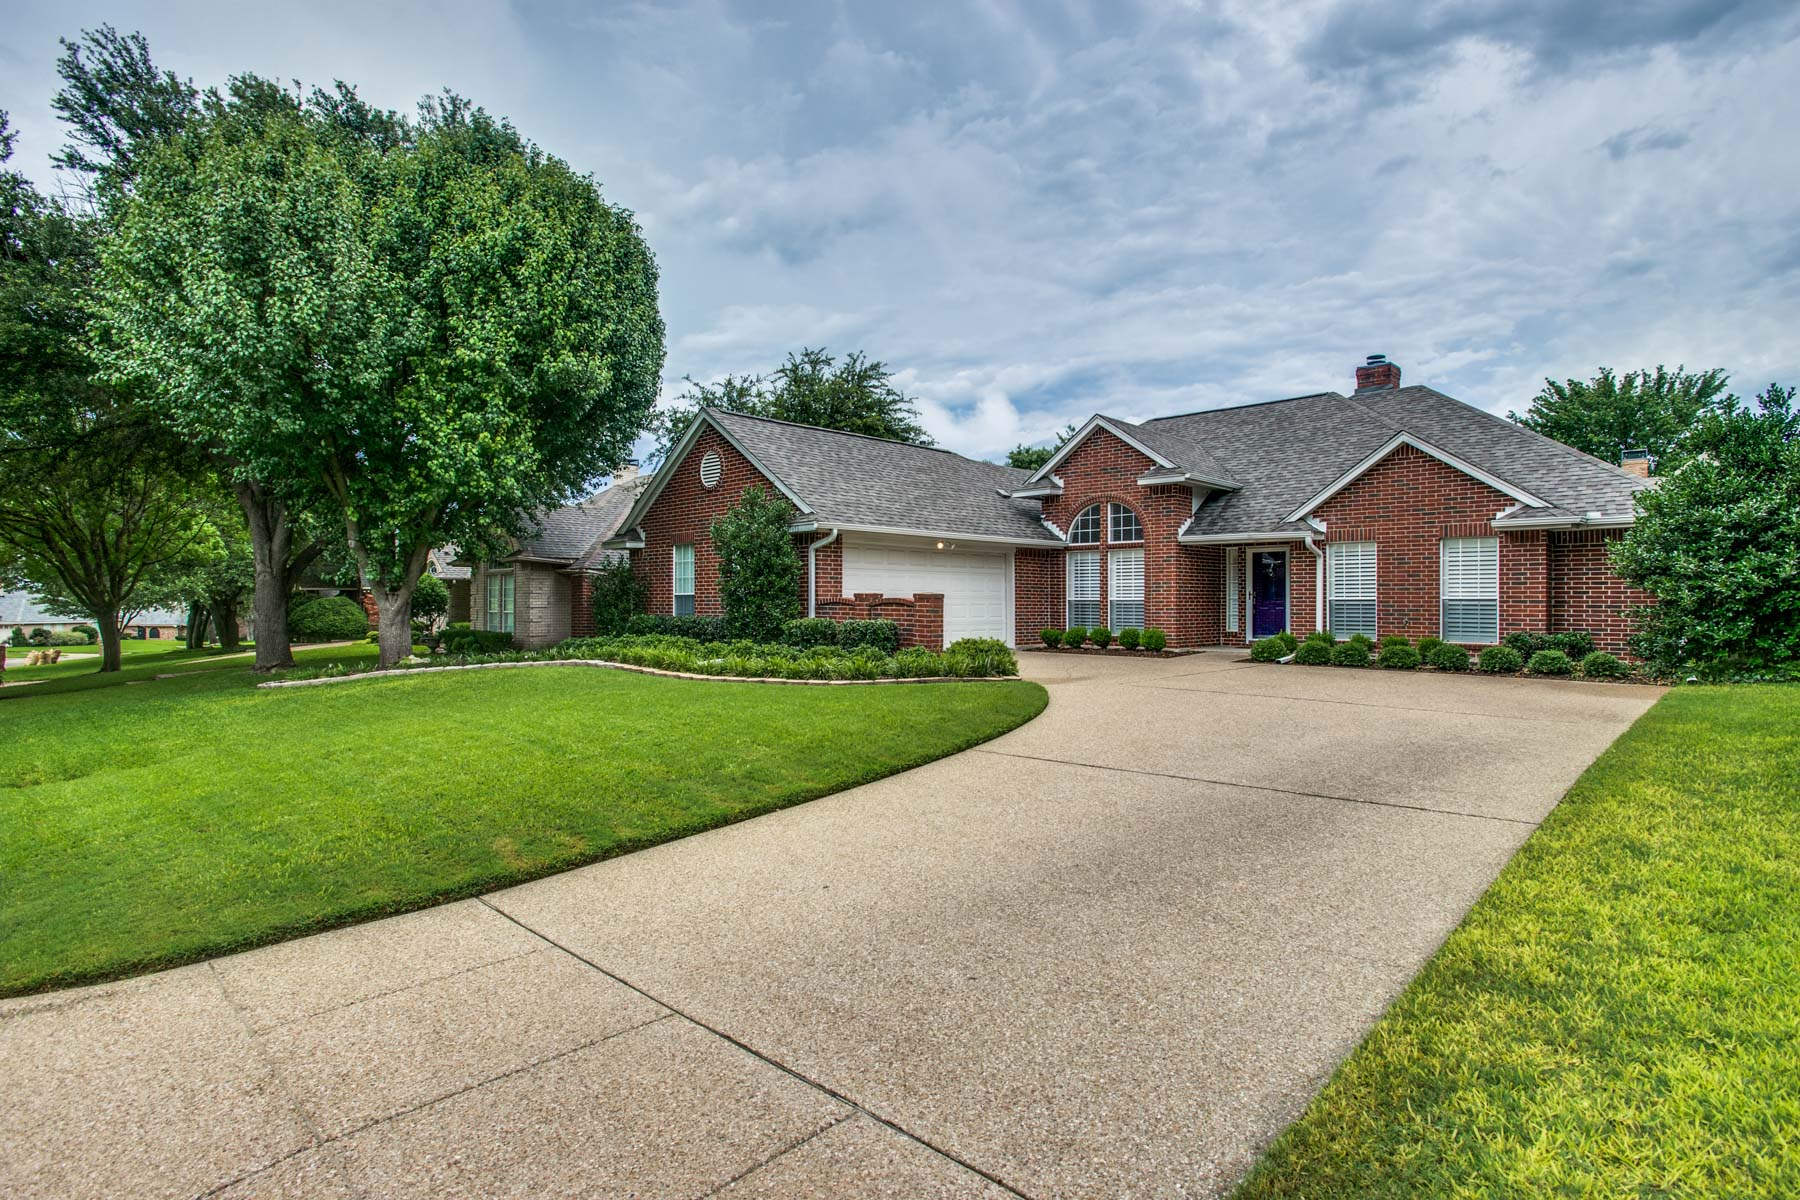 Casa para uma família para Venda às 7613 Ramble Wood Trail, Fort Worth 7613 Ramble Wood Trl Fort Worth, Texas, 76132 Estados Unidos